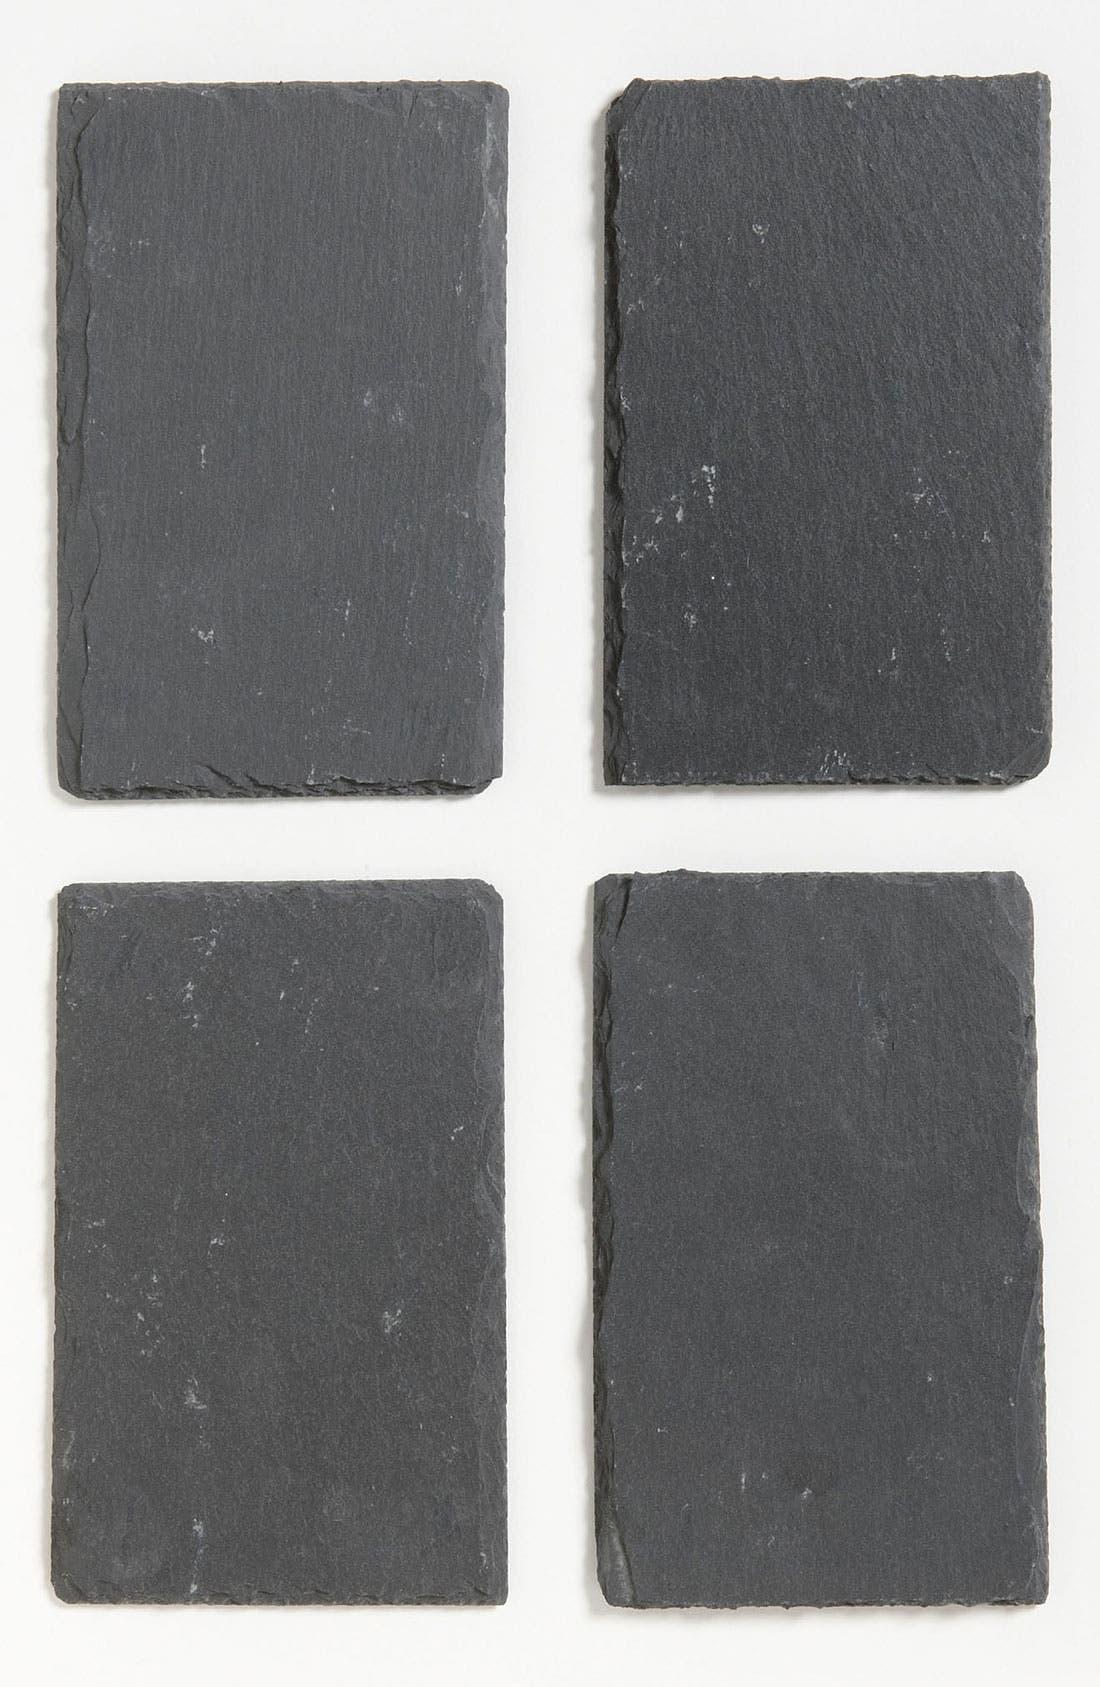 Main Image - 'Monaco' Slate Cheese Boards (Set of 4)